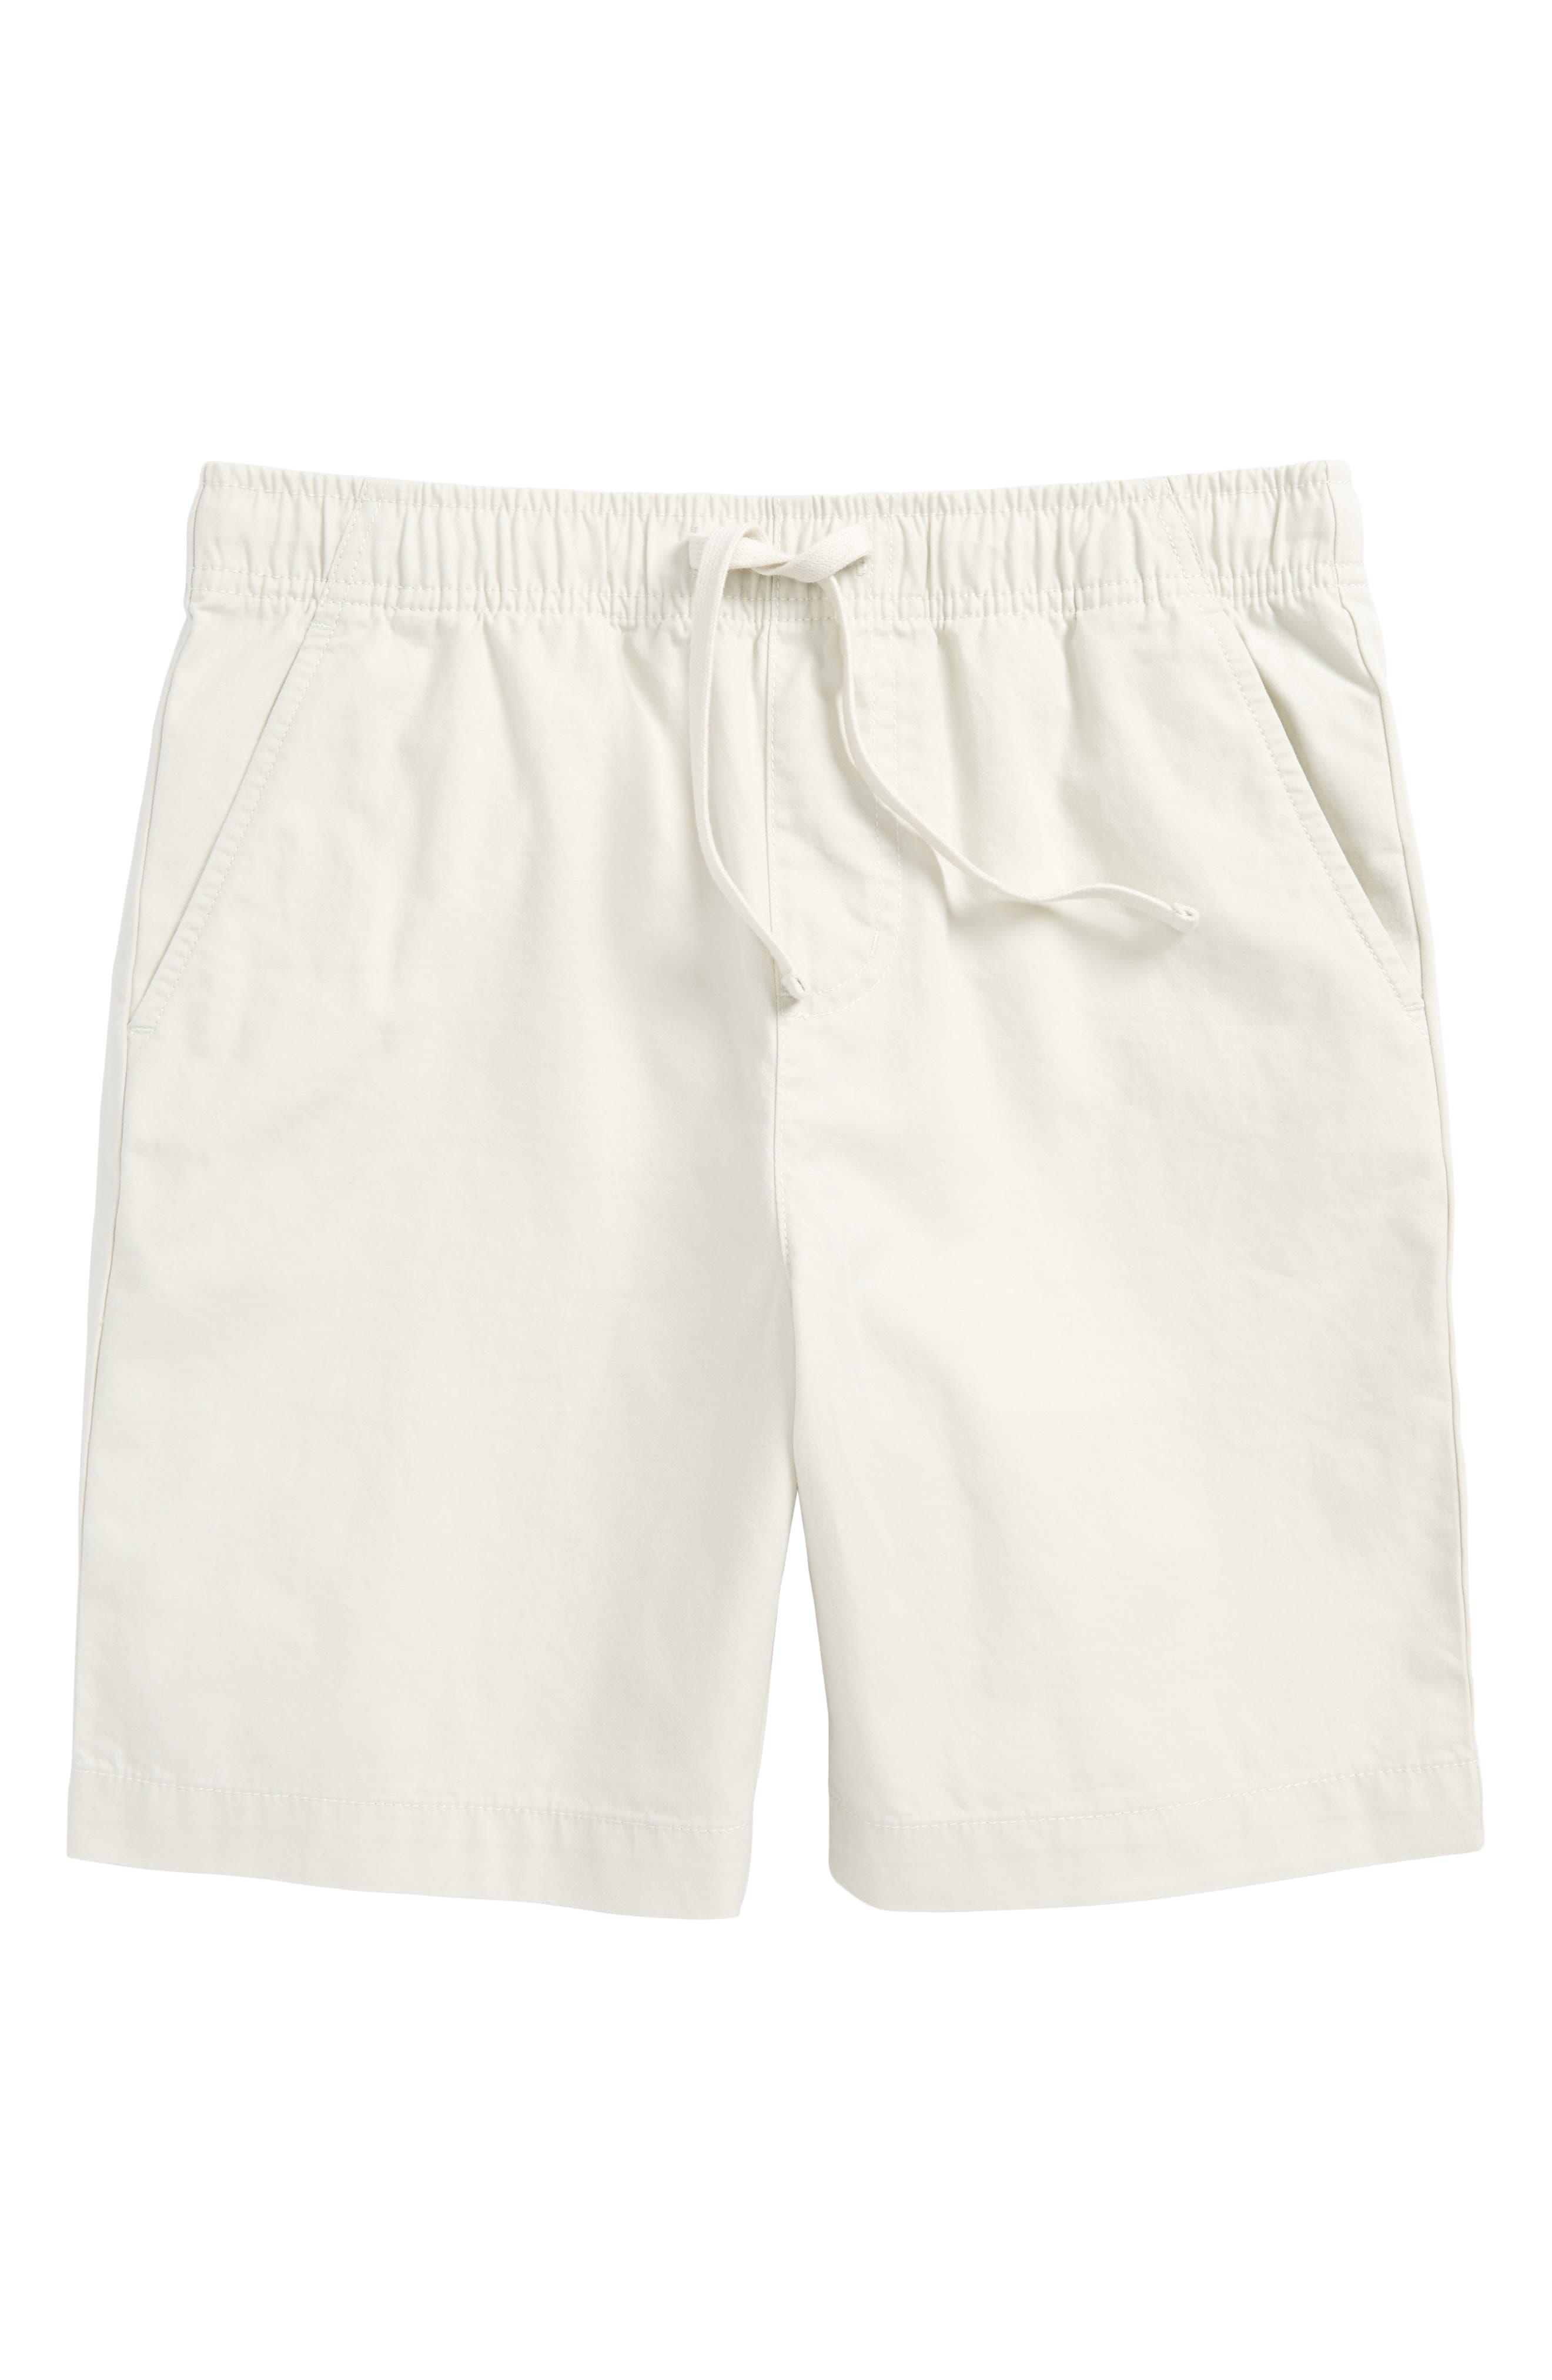 Alternate Image 1 Selected - Vineyard Vines Elastic Waist Shorts (Big Boys)